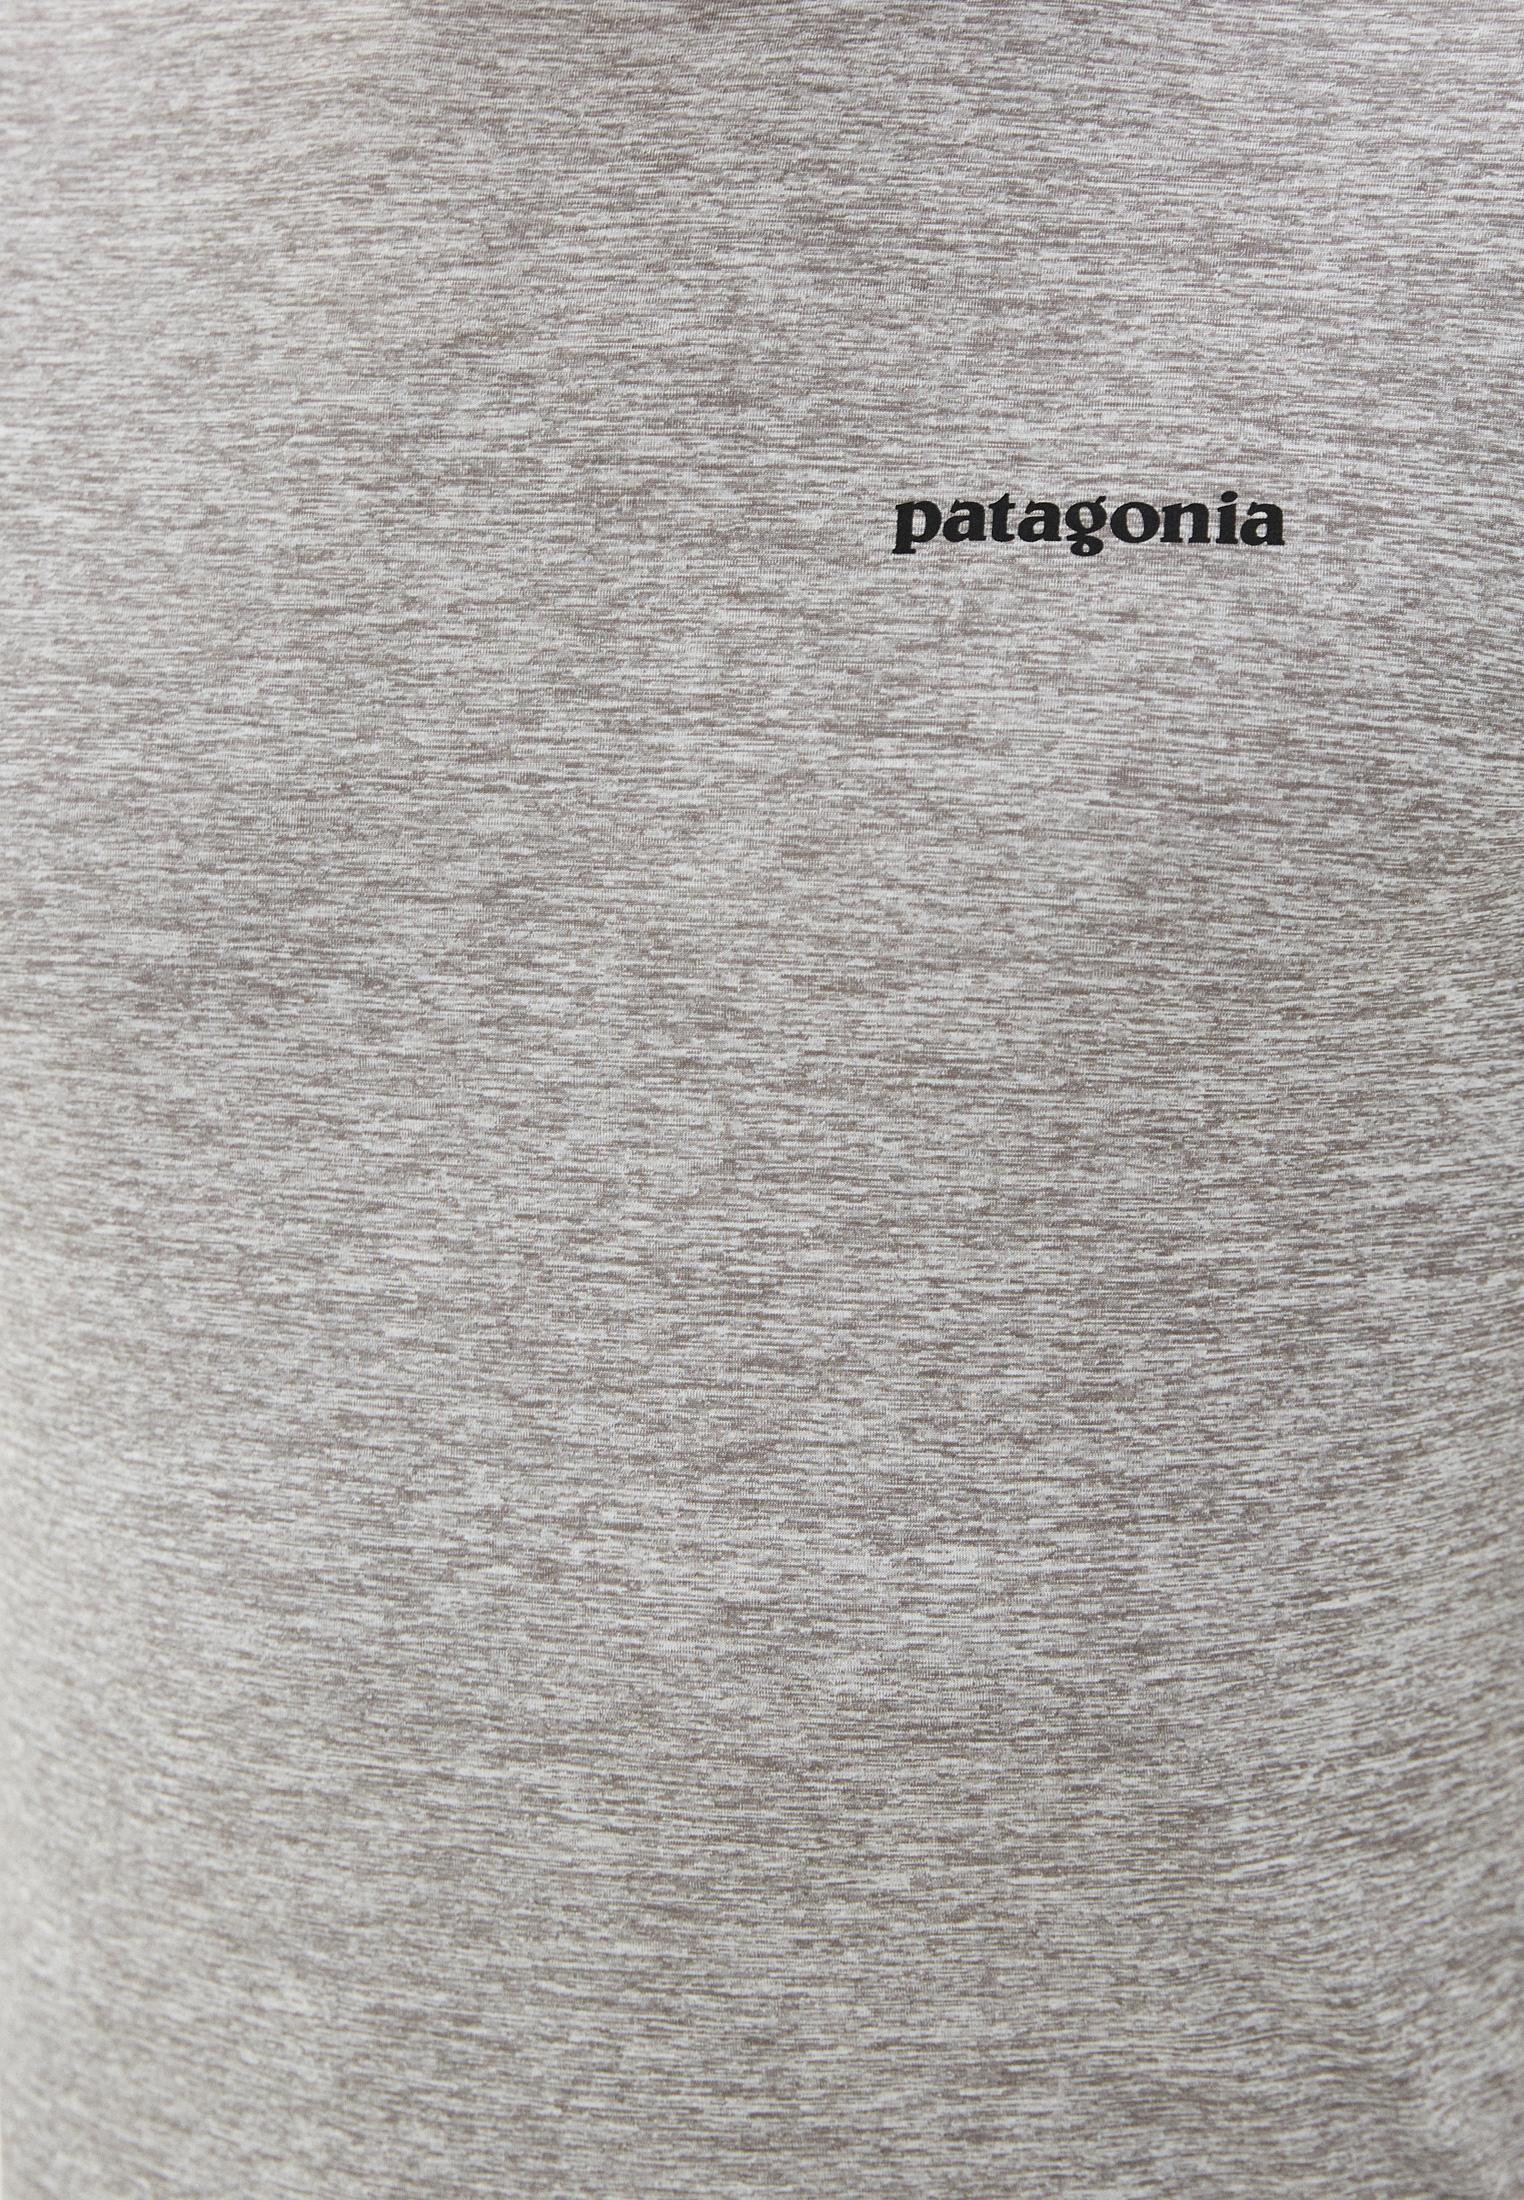 Футболка Patagonia 45235: изображение 4